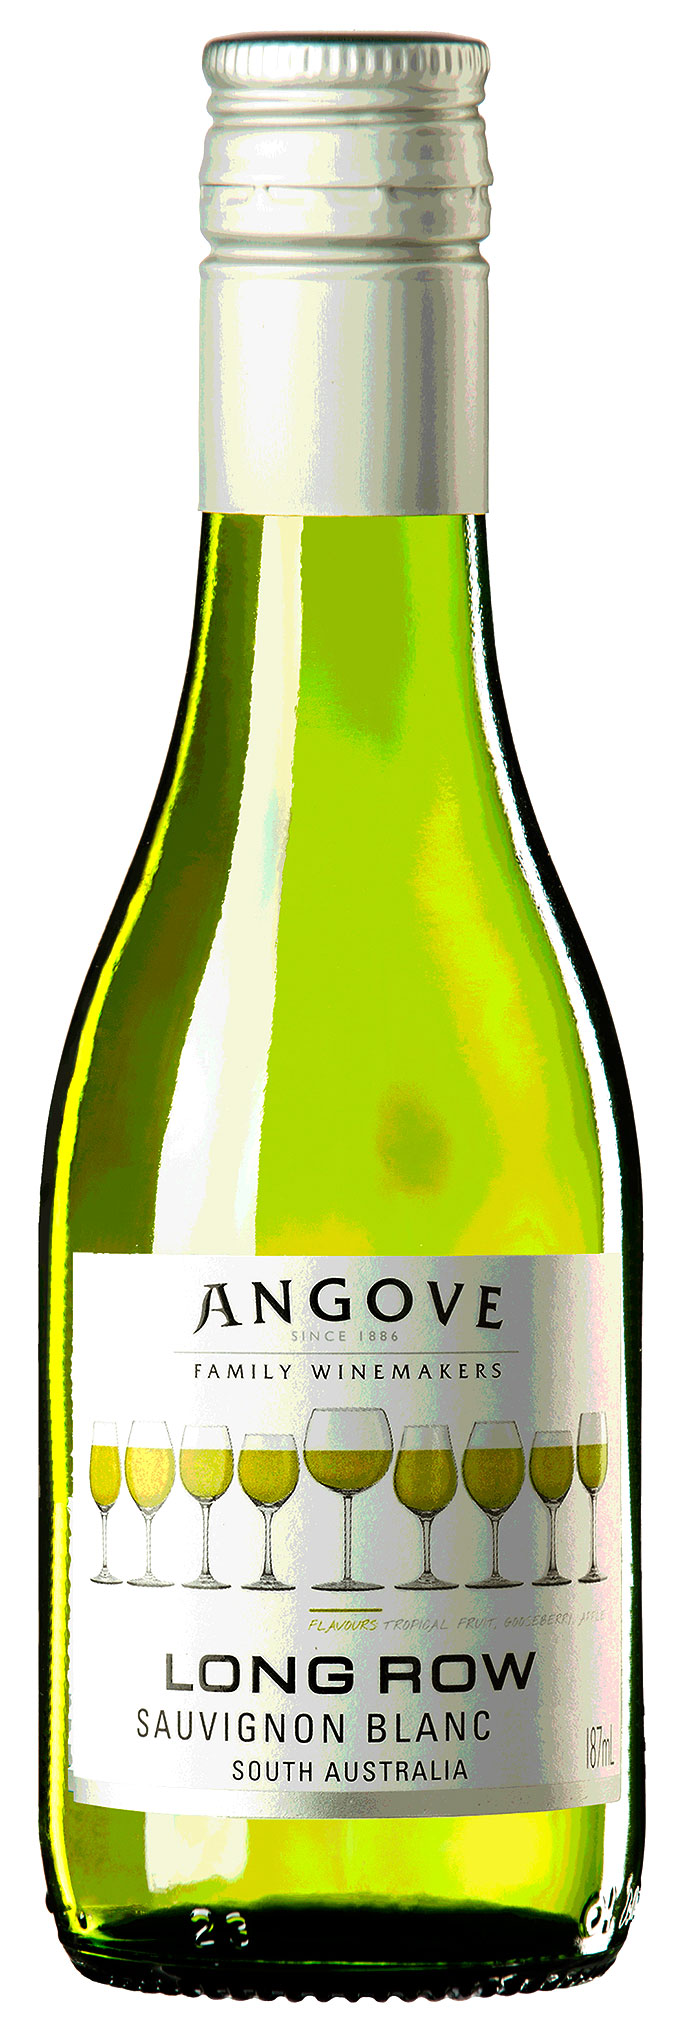 https://vinocorpperu.com/images/vinos/angove/long_row_sauvignon_blanc_2020_187.jpg